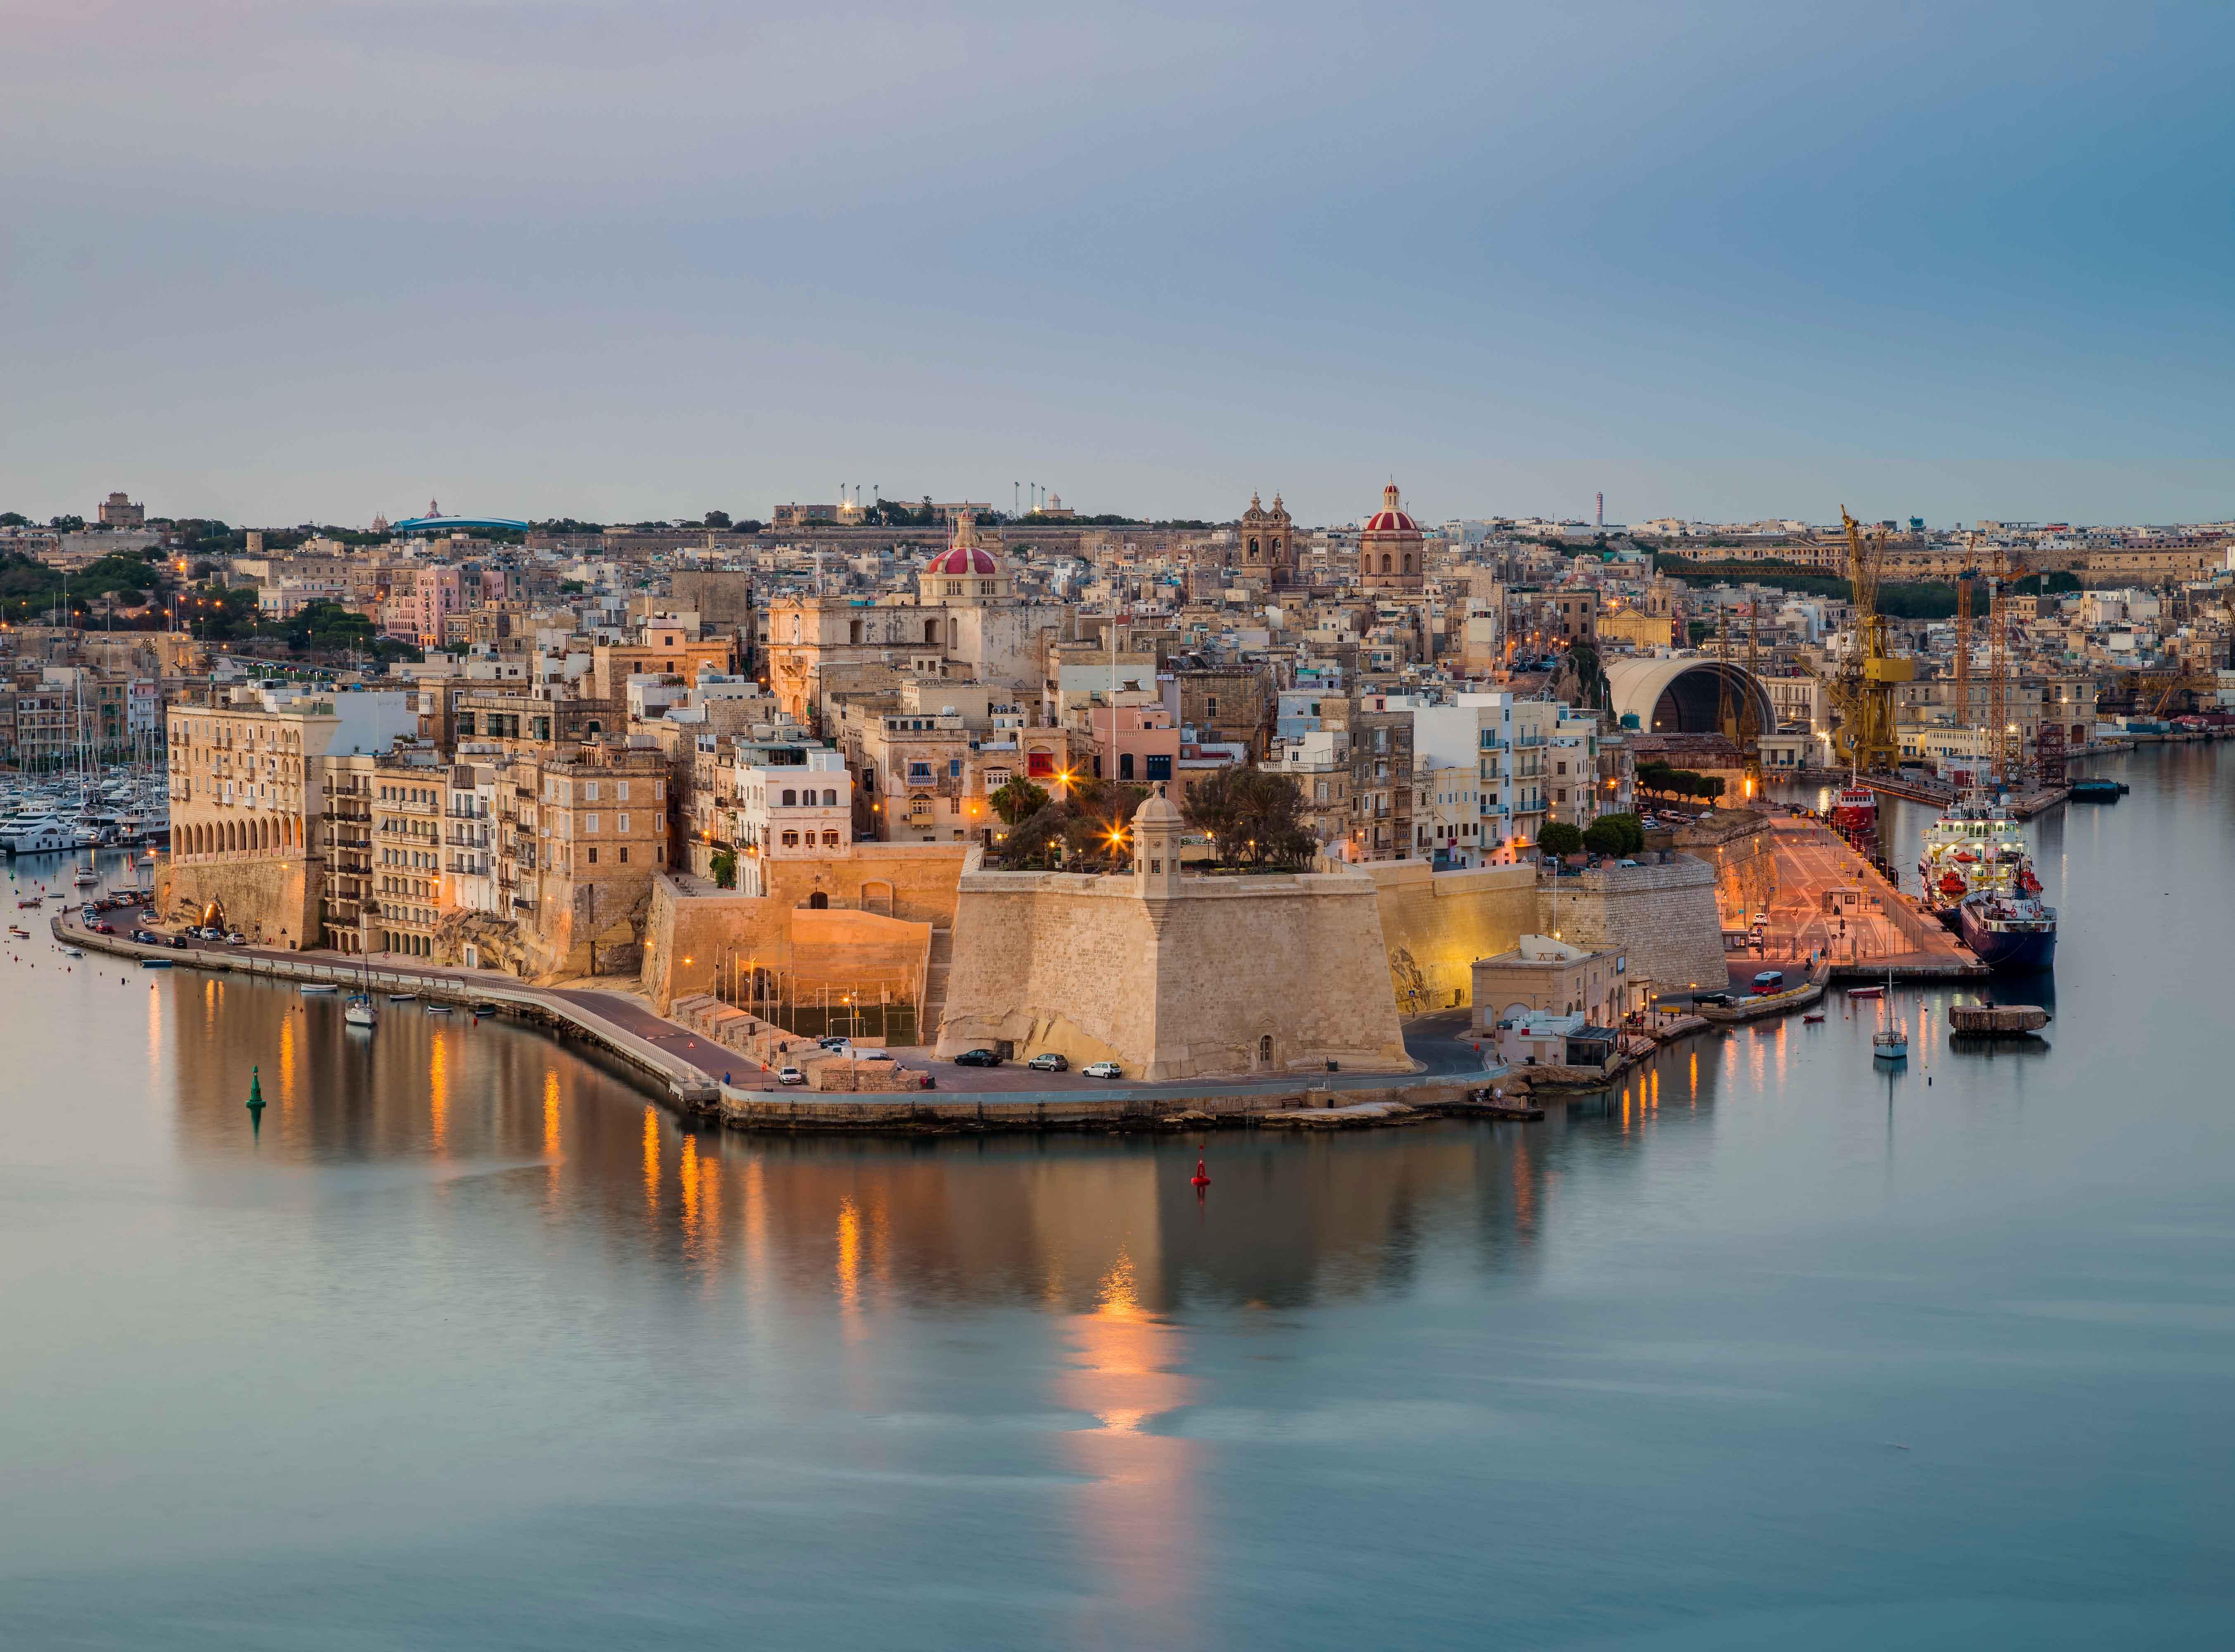 Canva---Malta---The-island-of-Senglea-and-Gardjola-Gardens